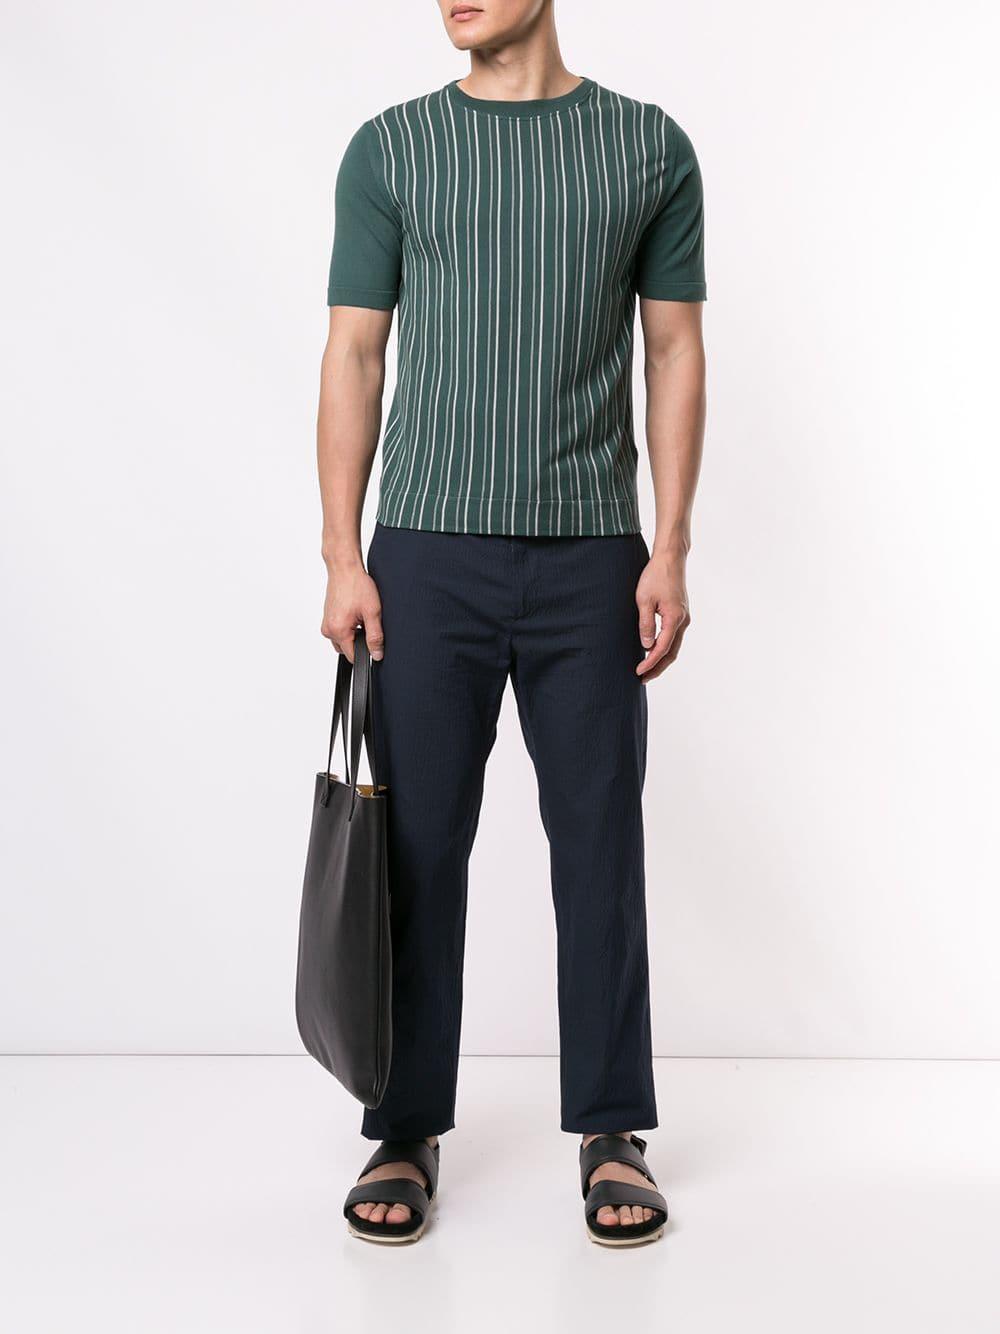 bacbf6a5 Cerruti 1881 Striped T-shirt in Green for Men - Lyst